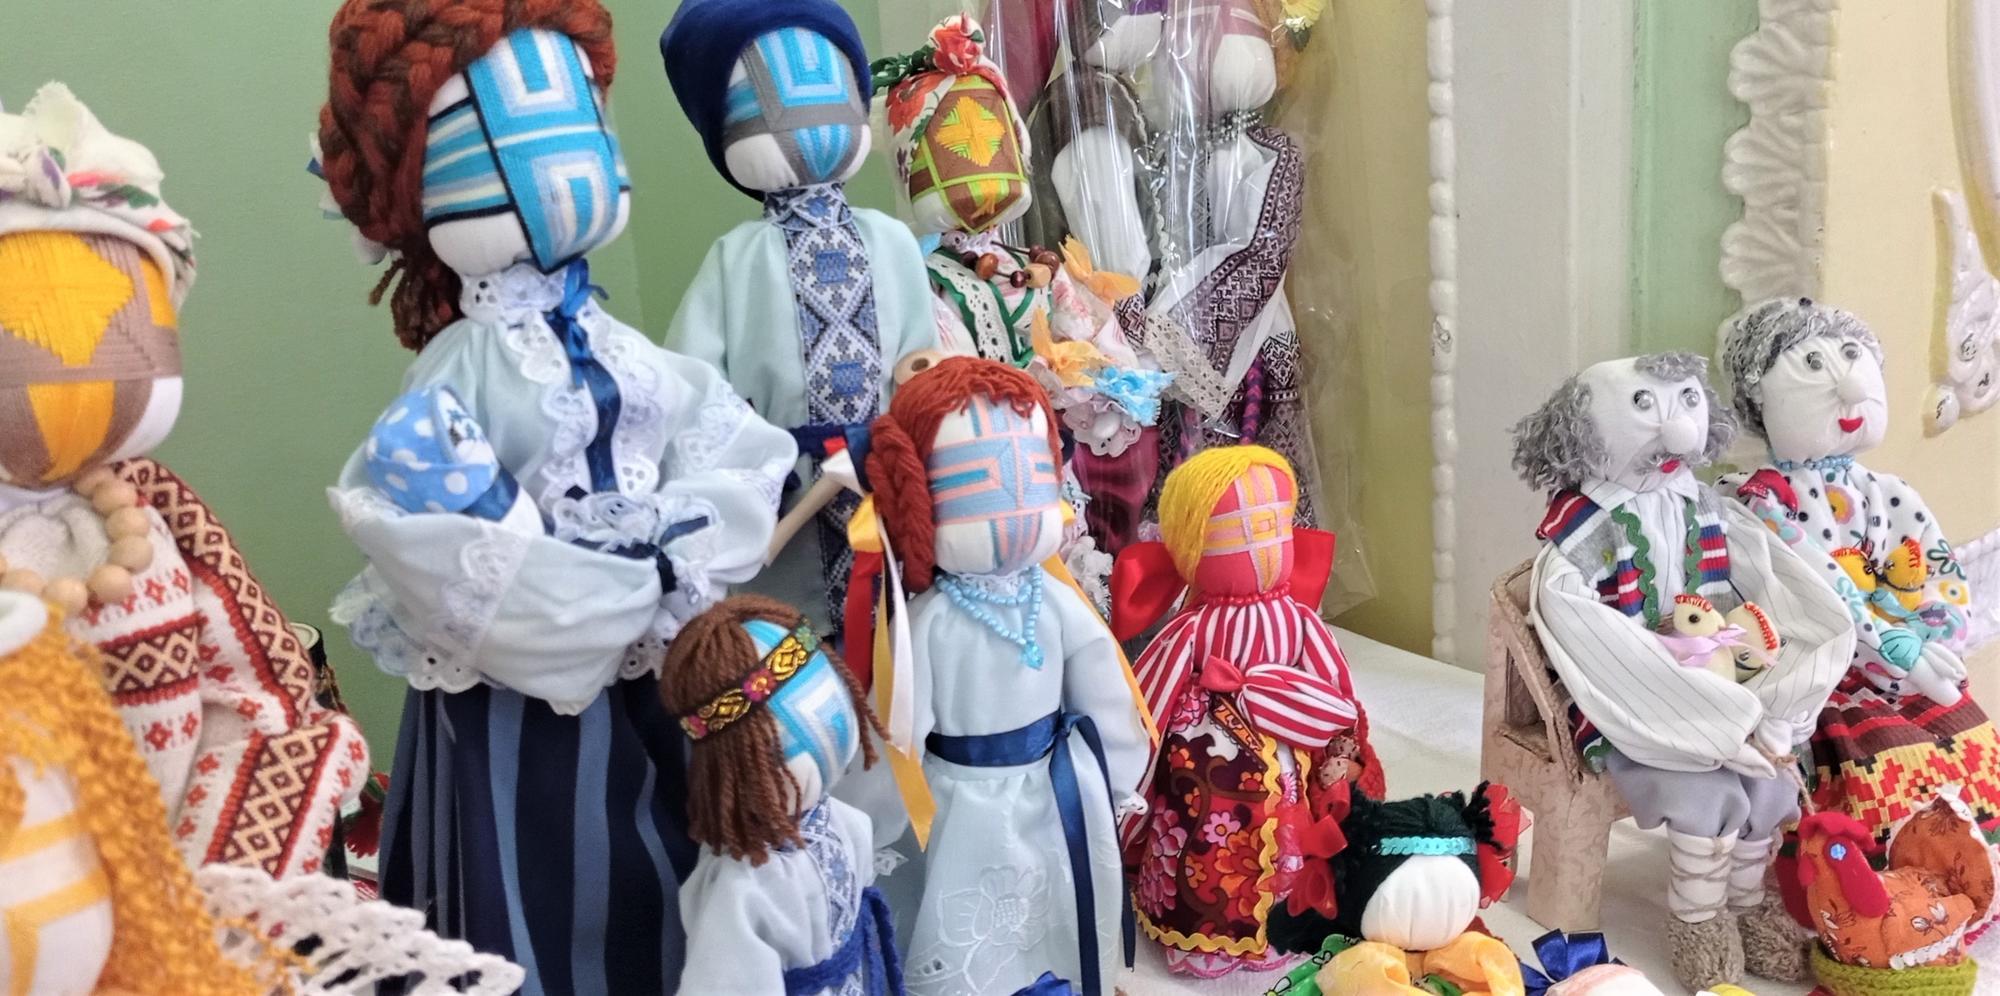 ляльки-мотанки в Нью-Йорку